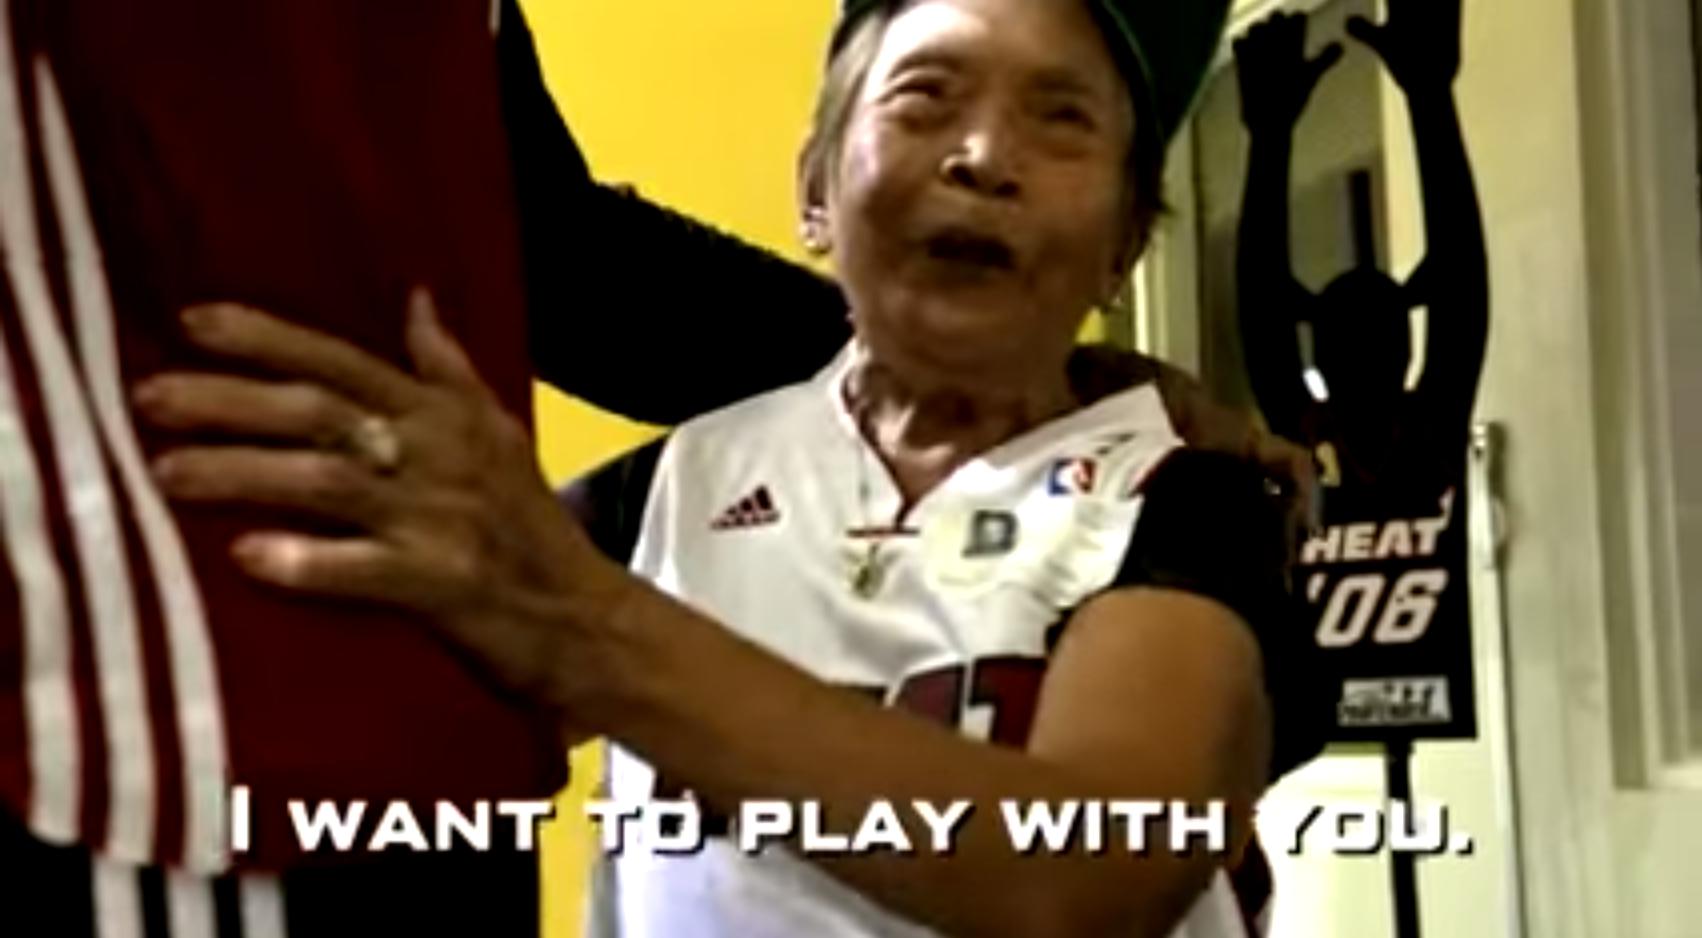 90 year old grandma dwyane wade